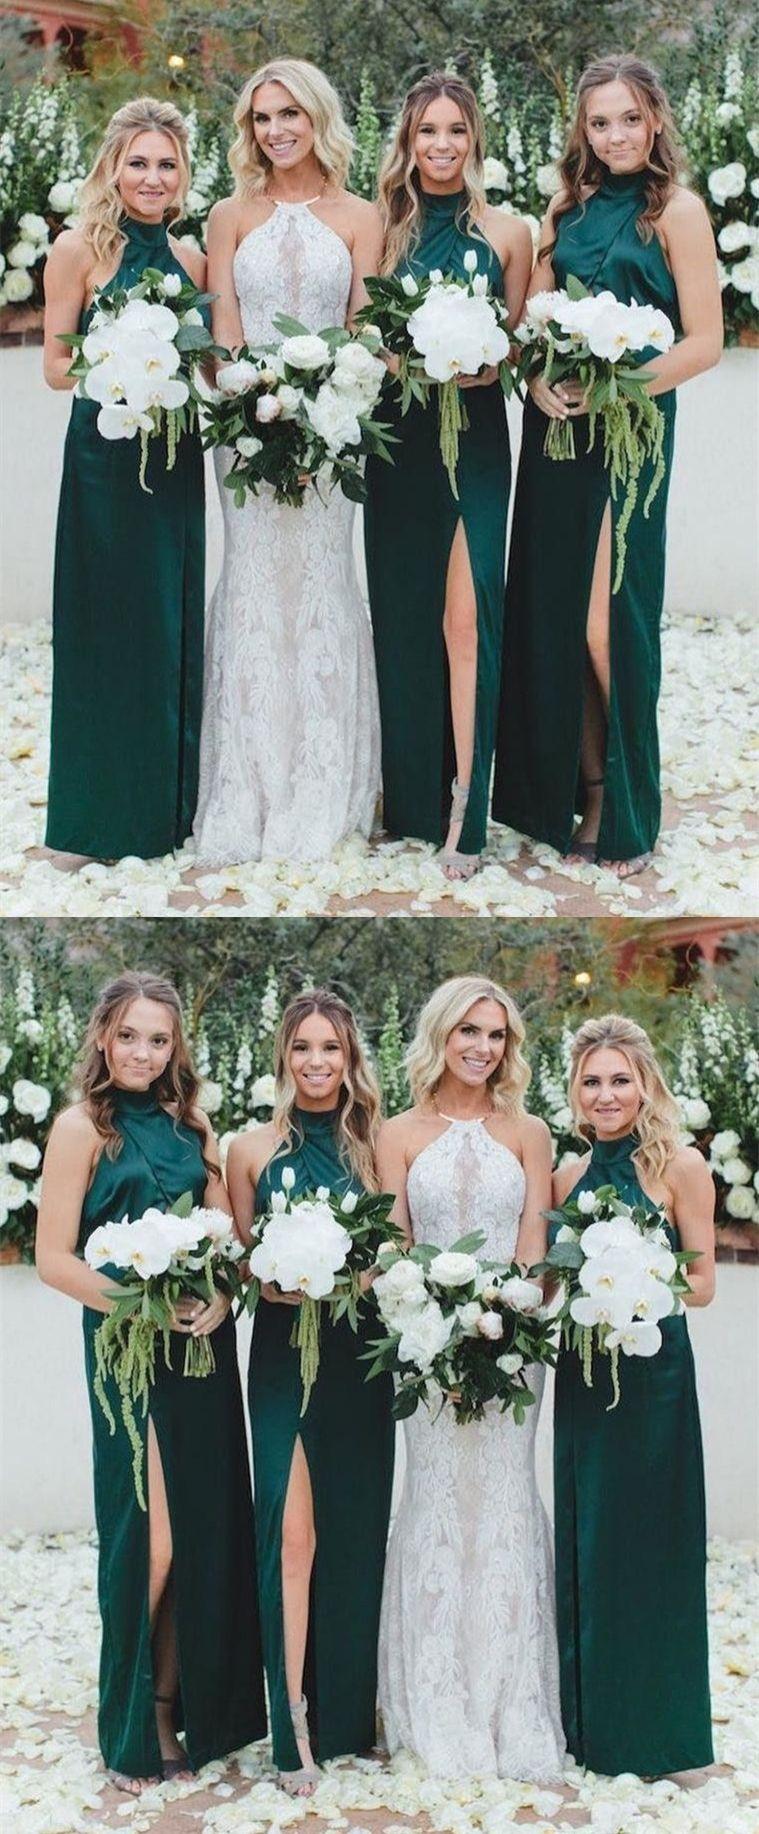 Elegant High Neck Dark Green Long Bridesmaid Dresses Formal Evening Dresses For Women Dr Green Bridesmaid Dresses Dark Green Bridesmaid Dress Green Bridesmaid